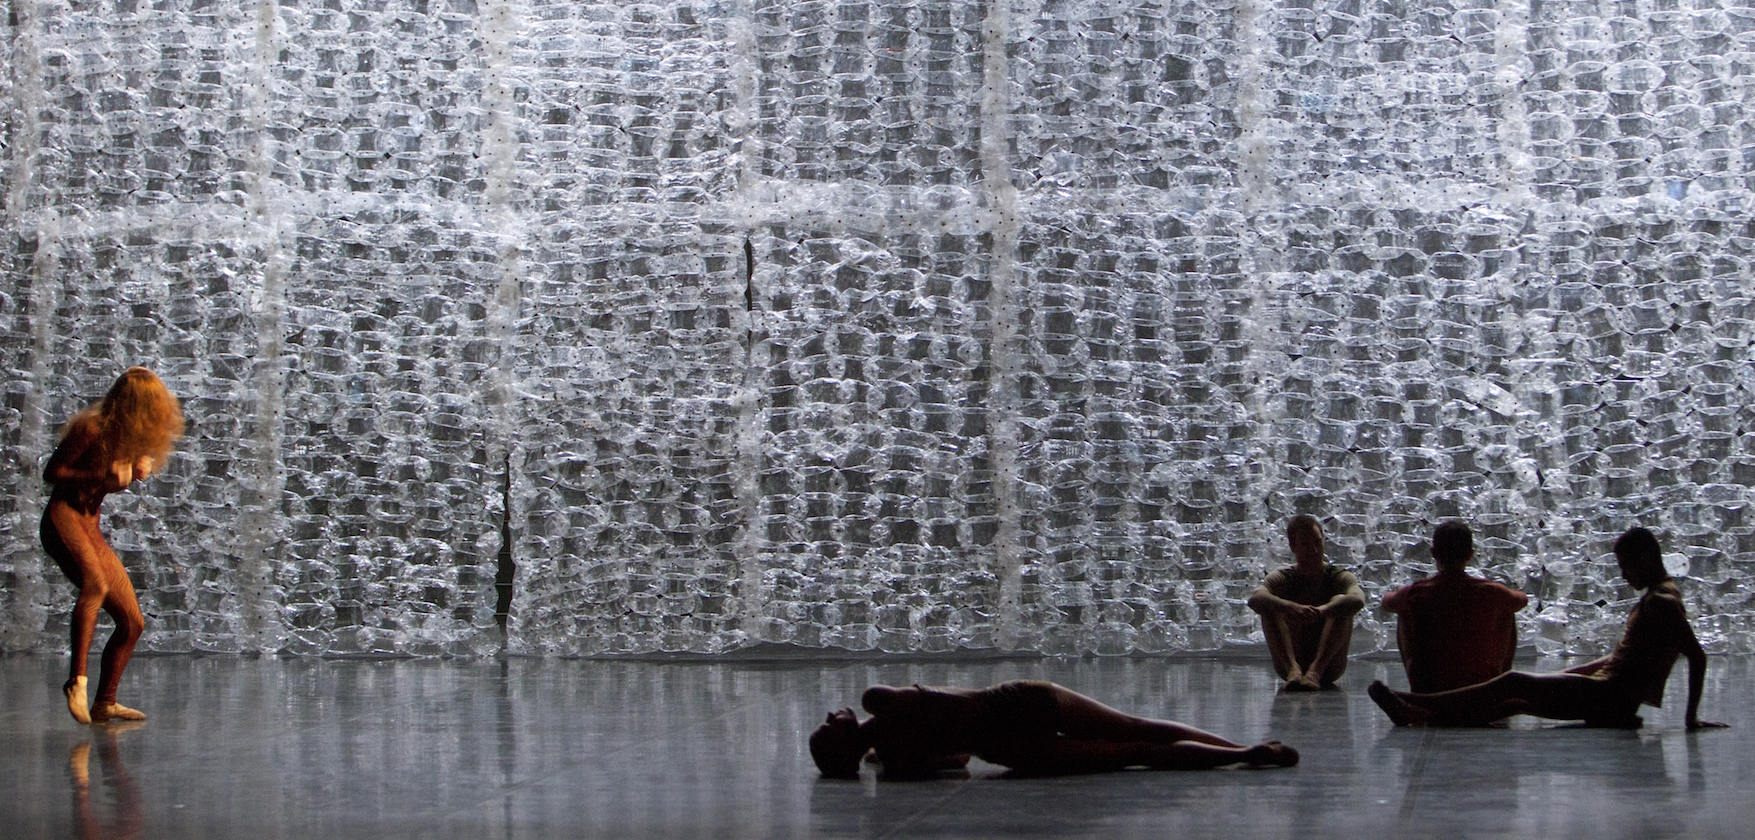 Ex-Stasis by Tania Perez Salas Compañía de Danza. Photo: Andrea López